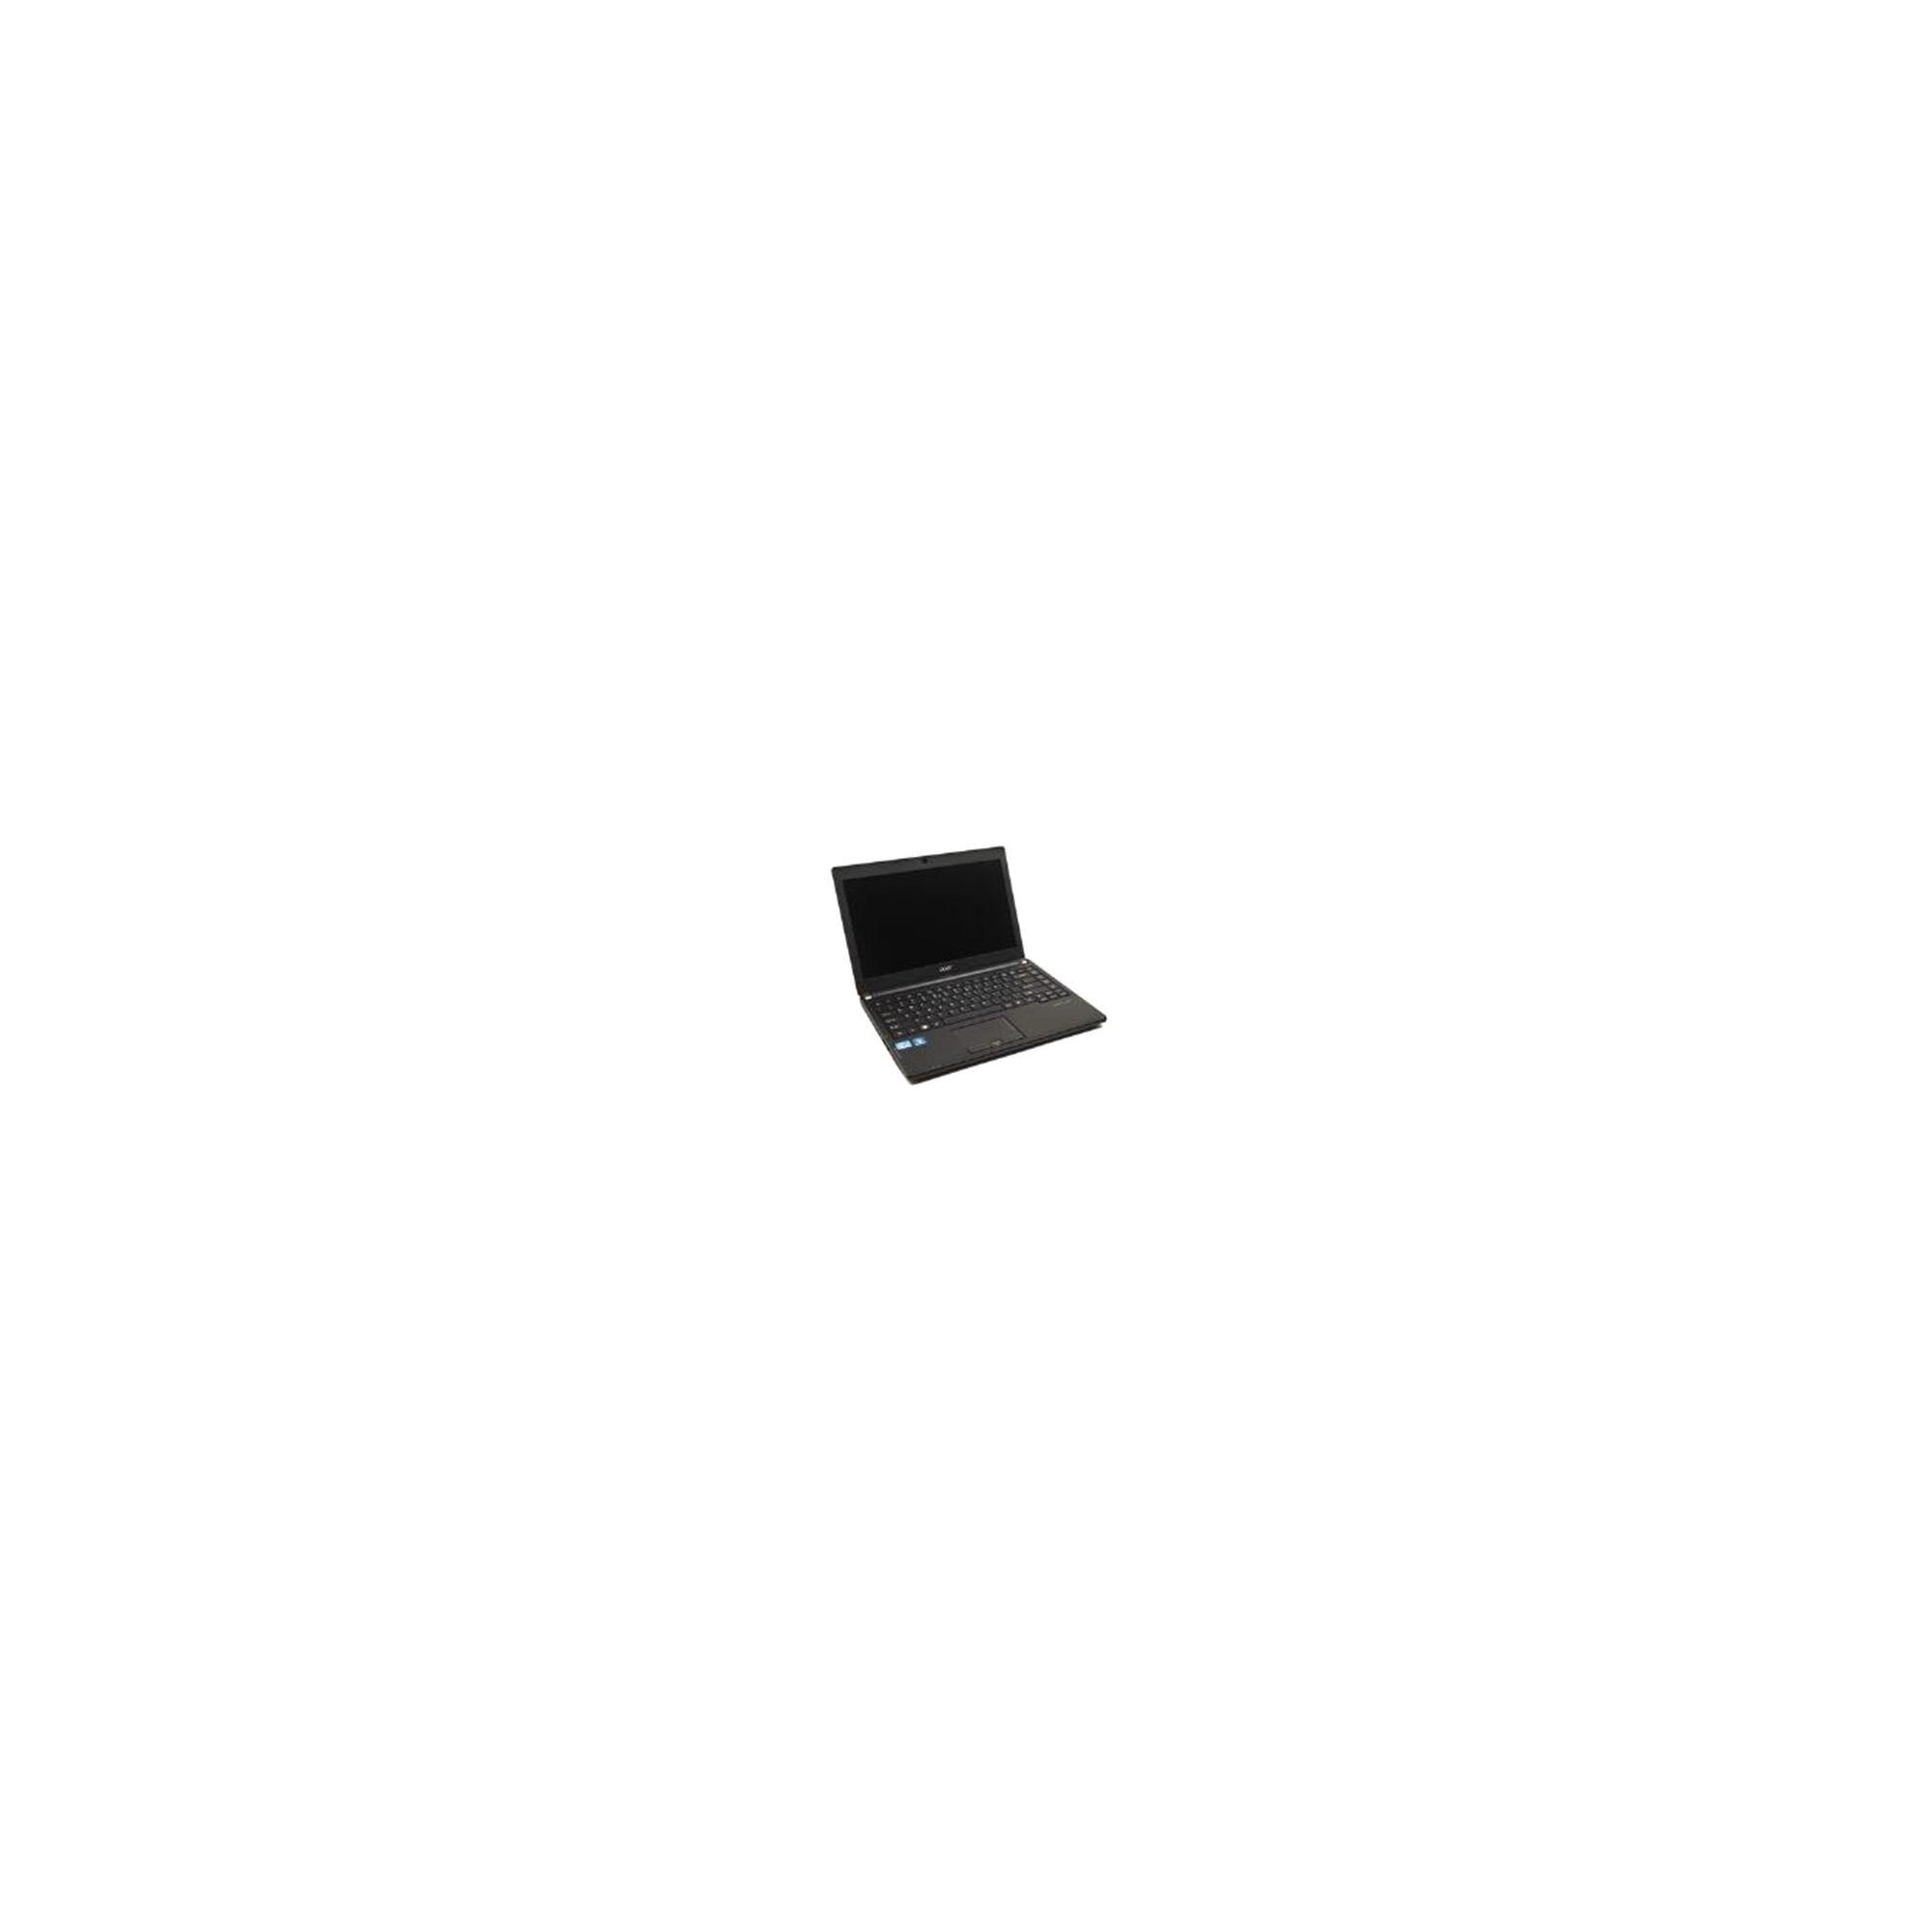 Acer TravelMate TMP633-M-736a6G50ikk (13.3 inch) Notebook Core i7 (3612QM) 2.1GHz 6GB 500GB WLAN BT 3G Webcam Windows 7 Pro 64-bit/32-bit Dual Load at Tesco Direct